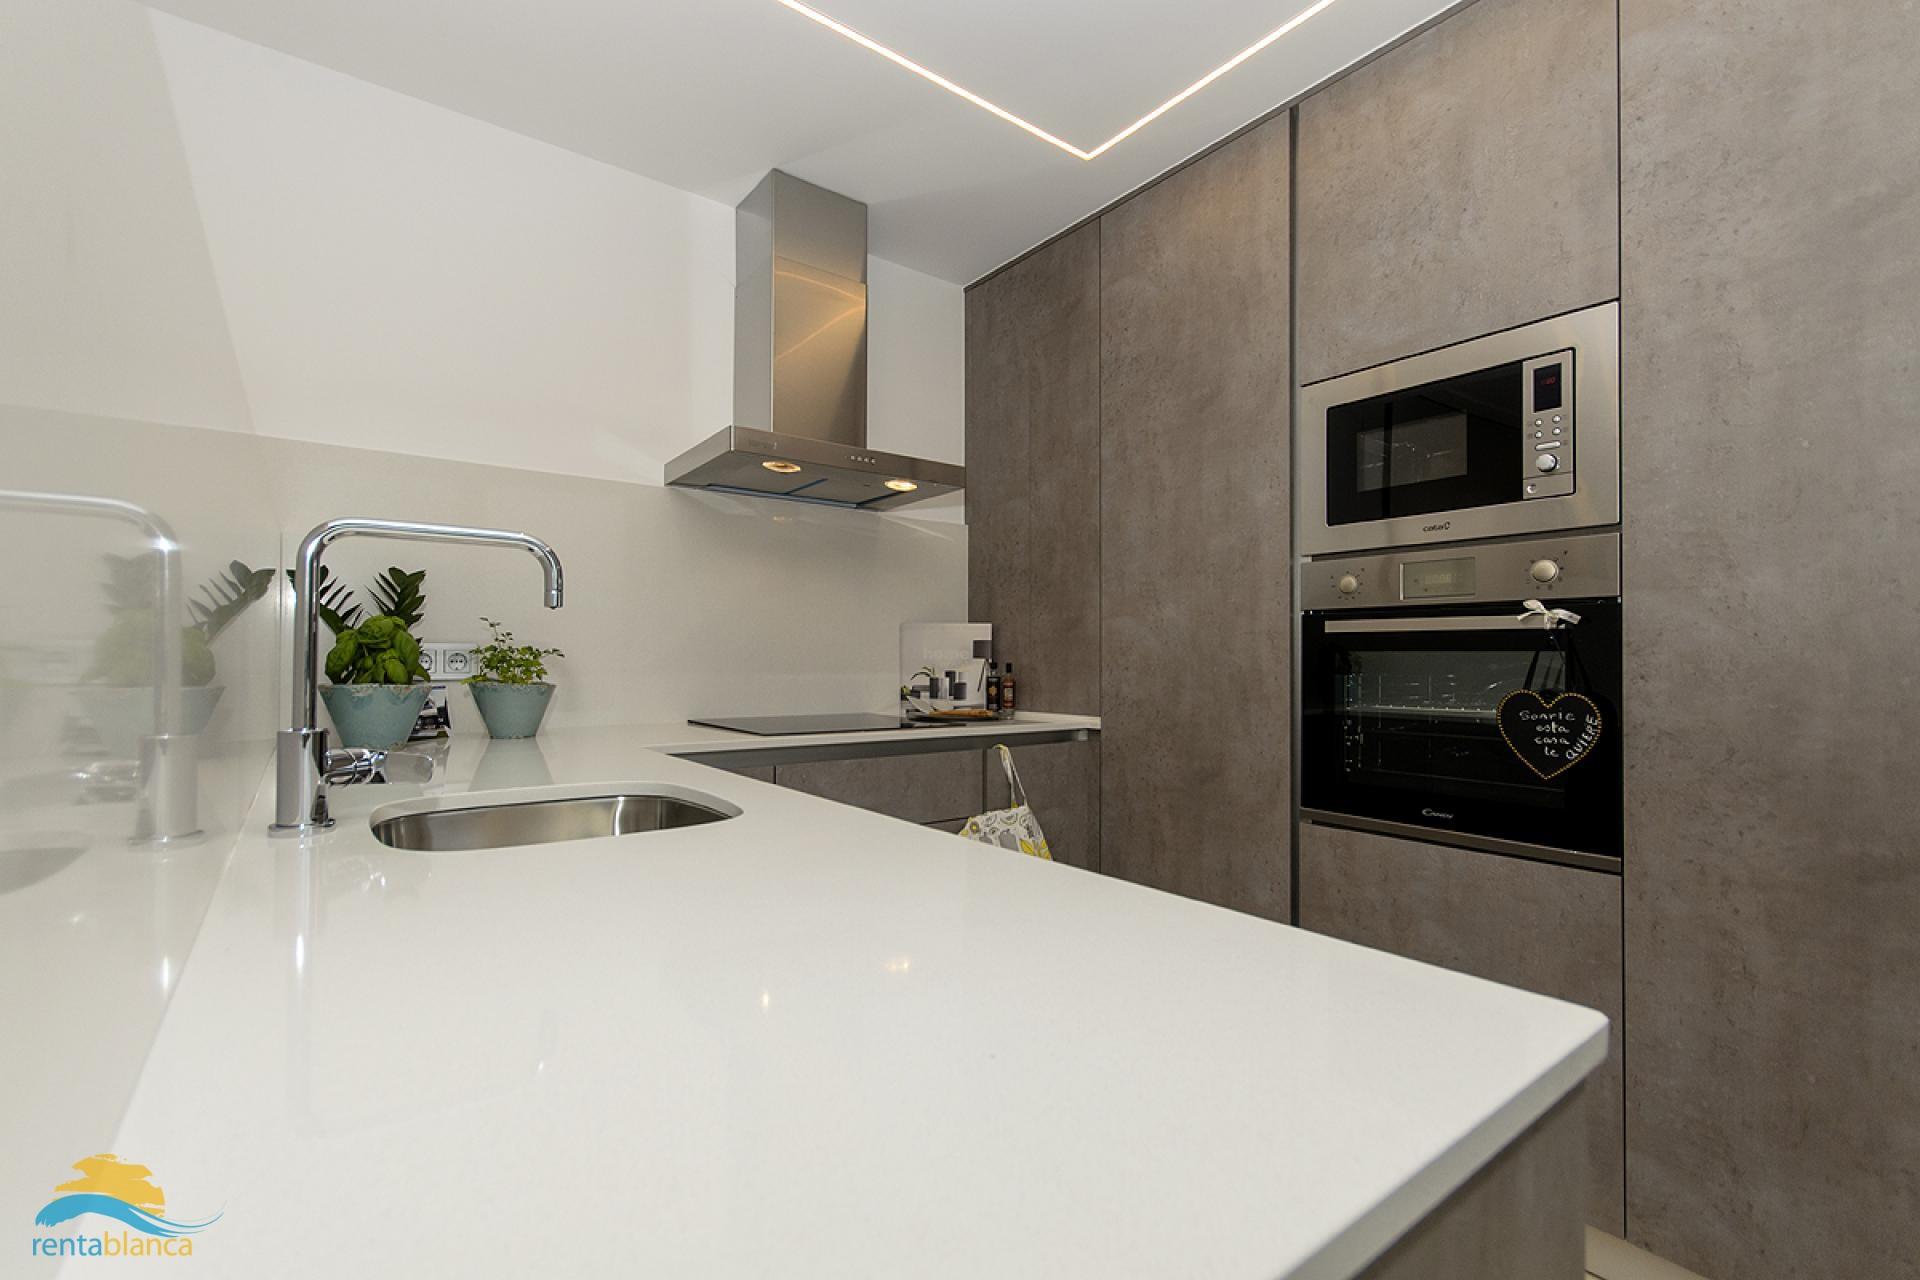 New build - modern detached villa - Villamartin - Rentablanca